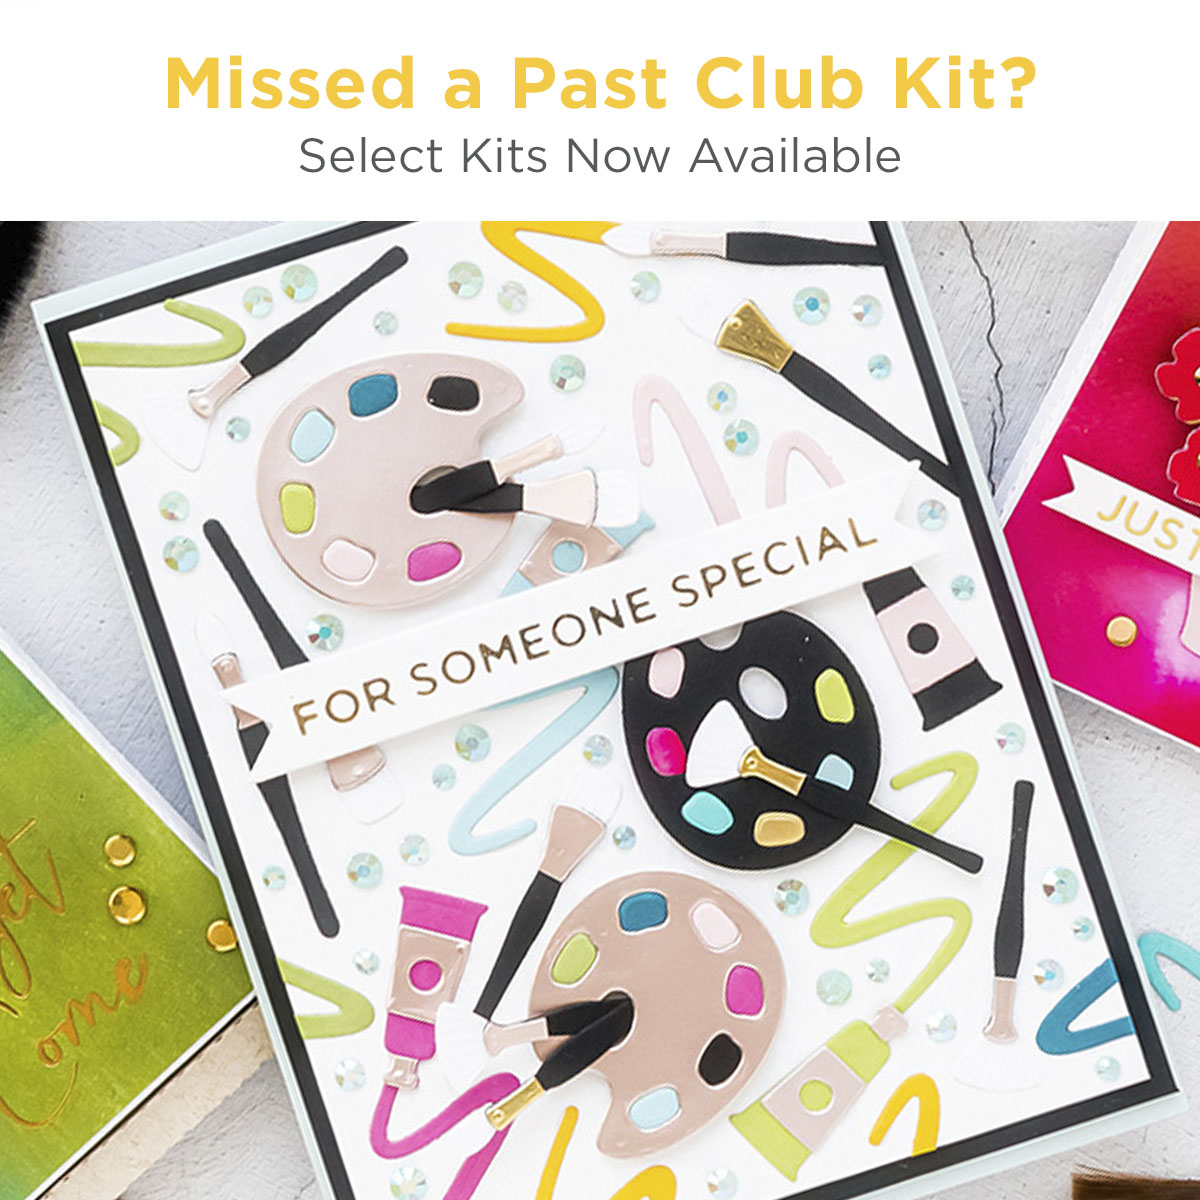 092820-Past-Club-Kit-Social-1200x1200.jpg